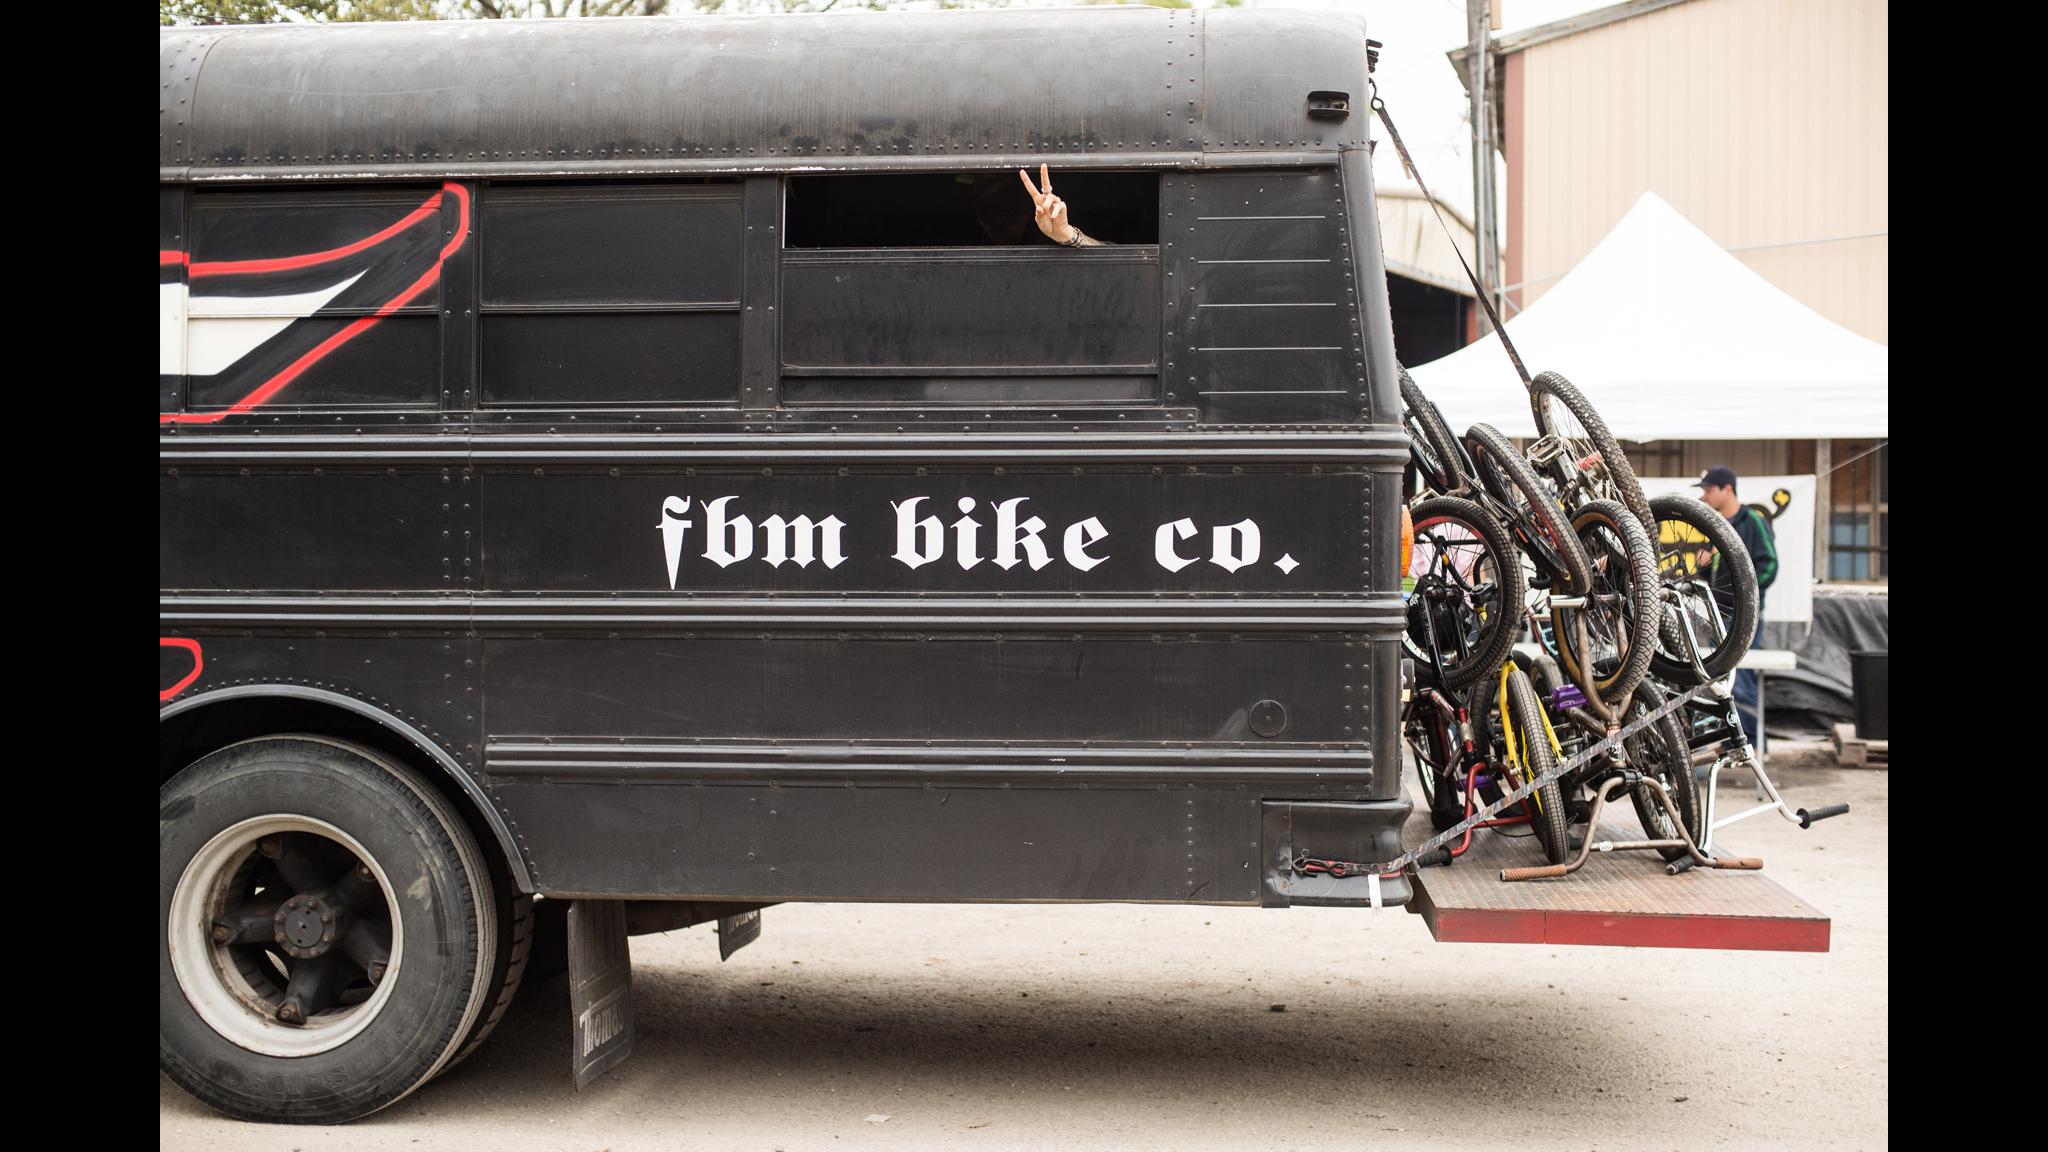 FBM school bus